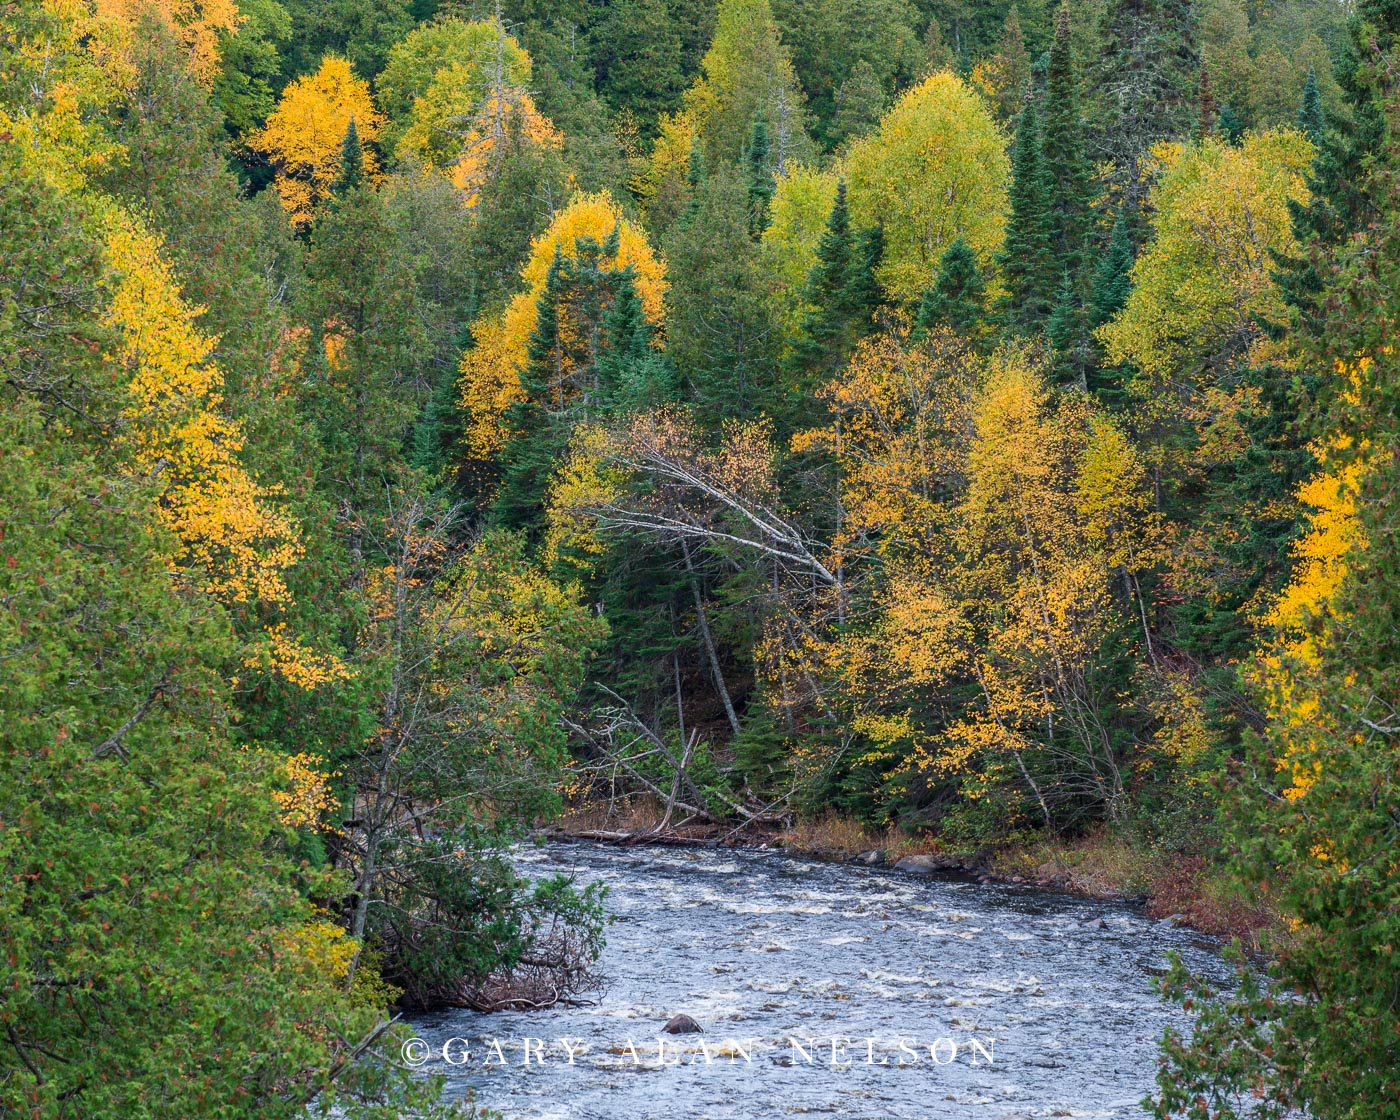 Cascade River in autumn, Cascade River State Park, Minnesota